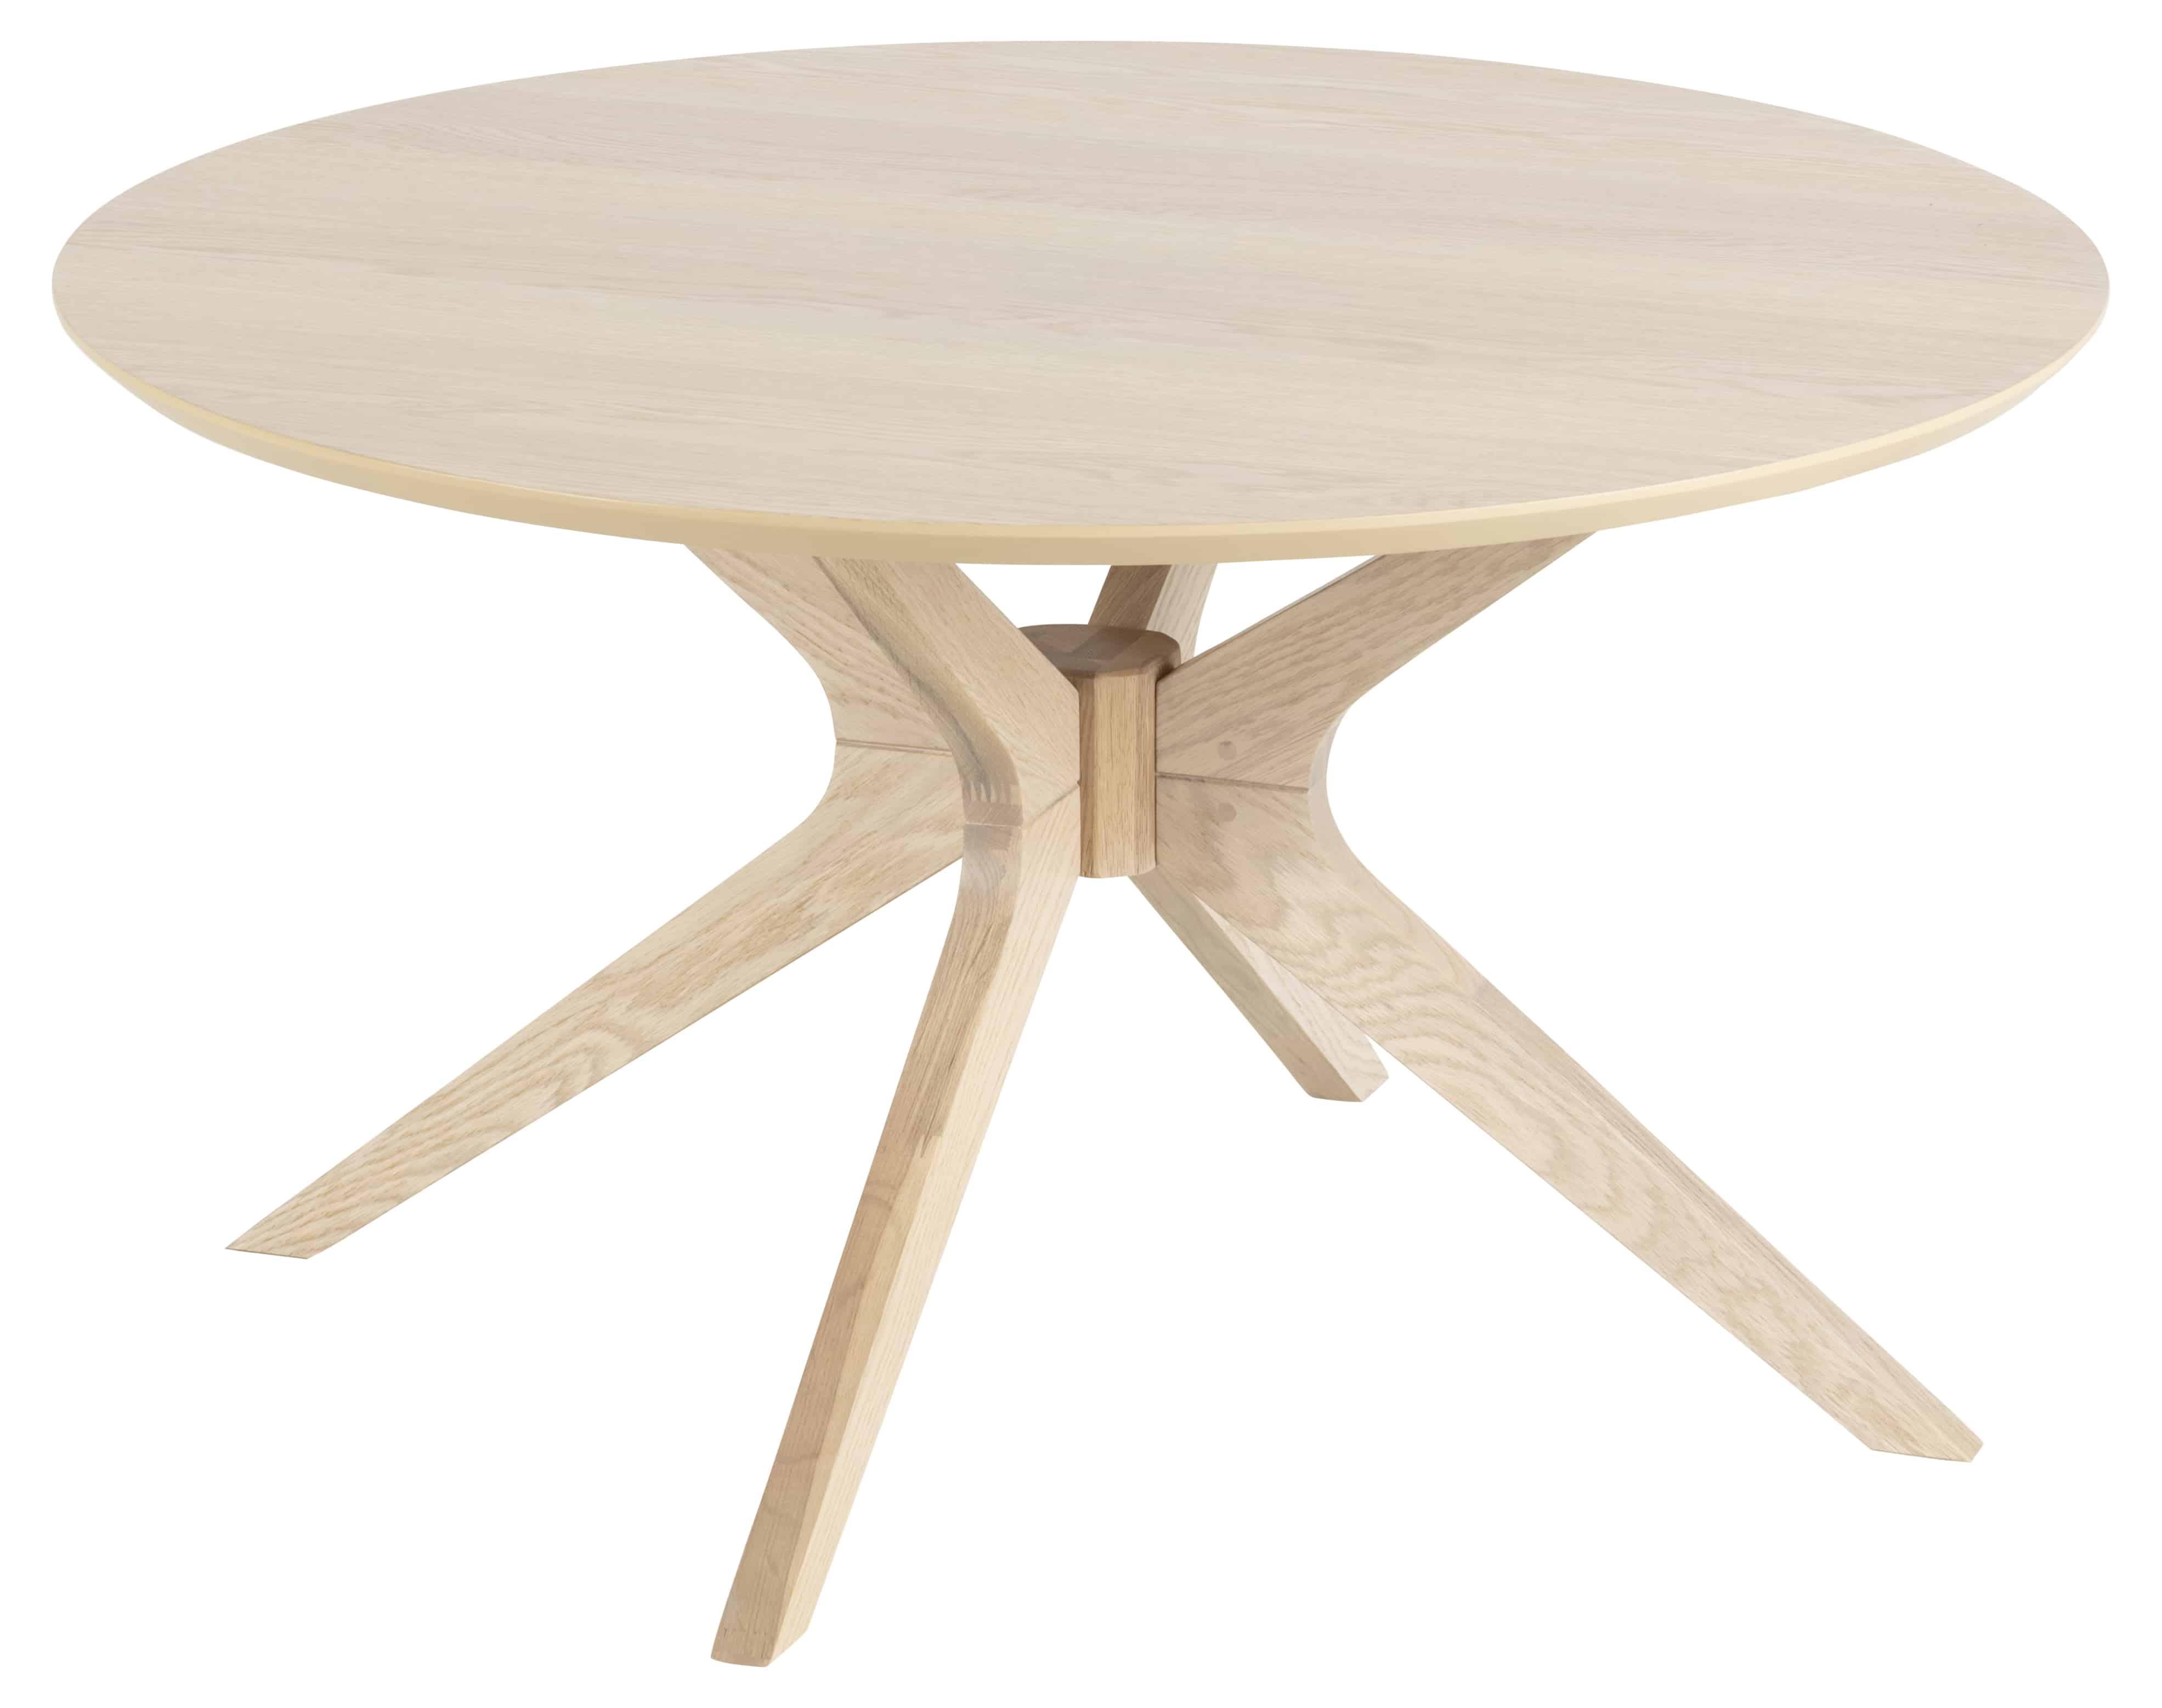 Duncan sofabord - natur egetræsfinér/egetræ, rund (Ø80)